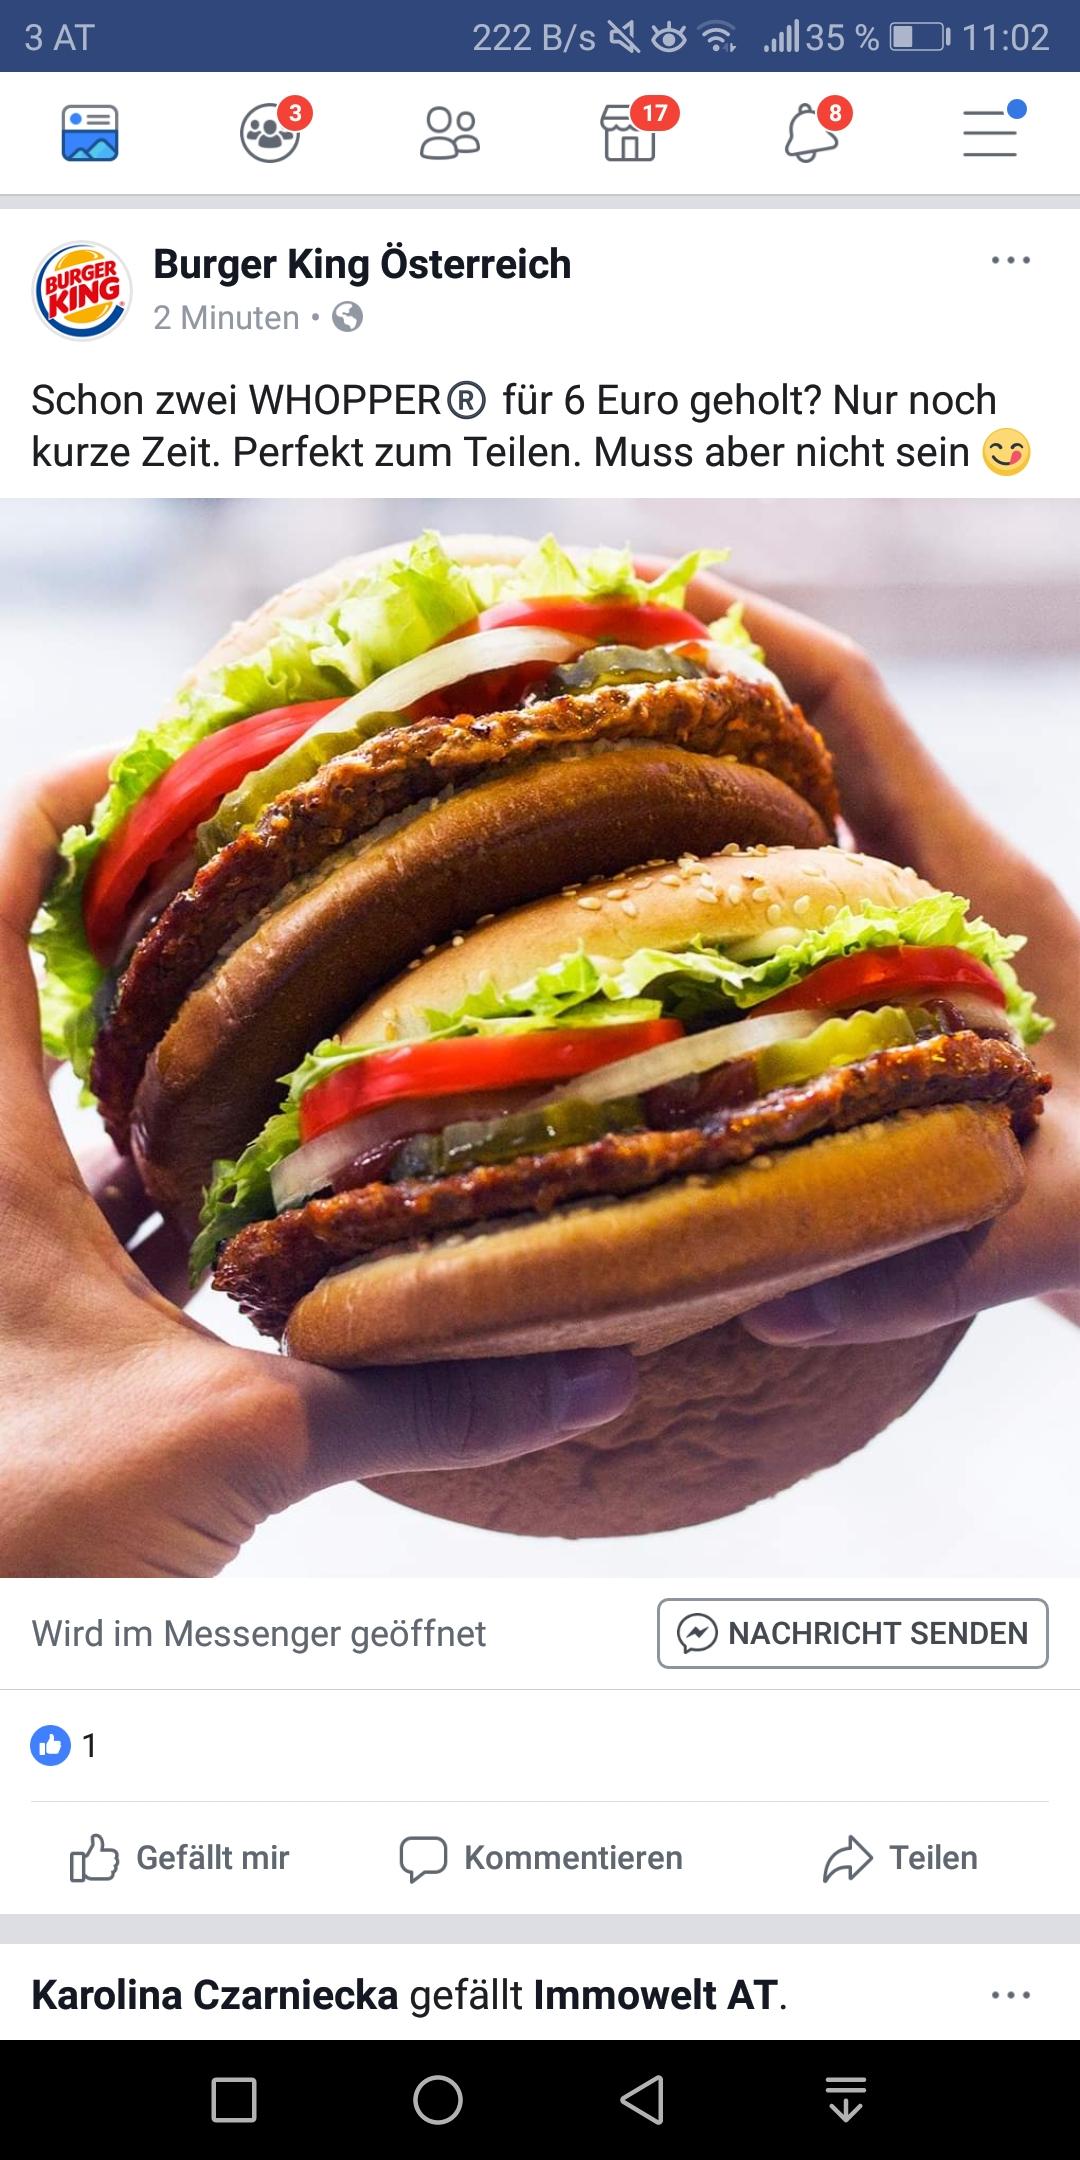 Burger King 2 Whopper für 6euro